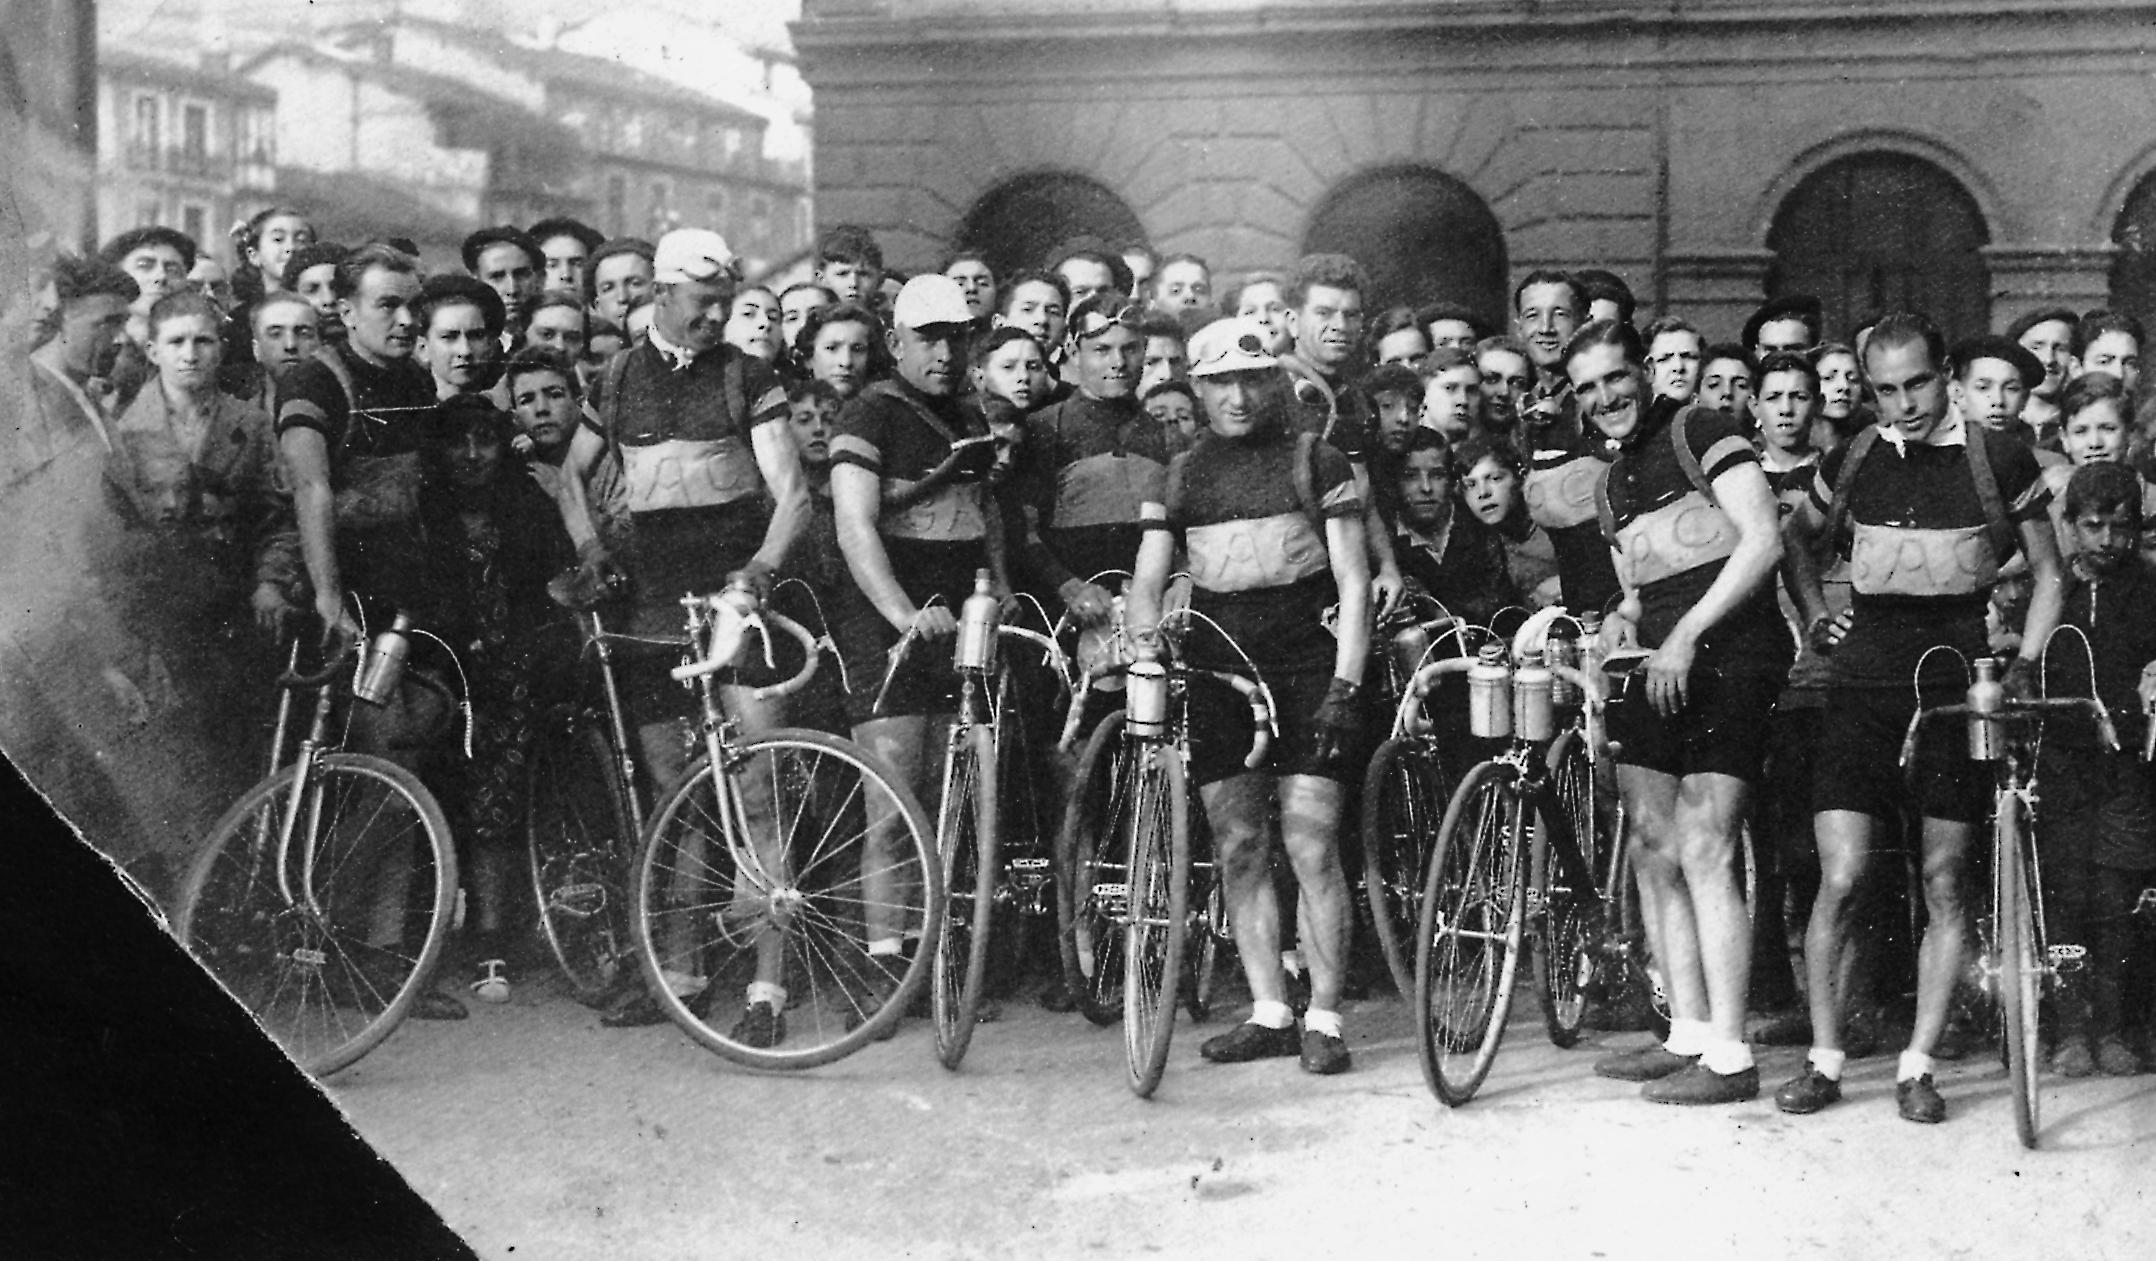 1935 1935GACT.ALD.tiff